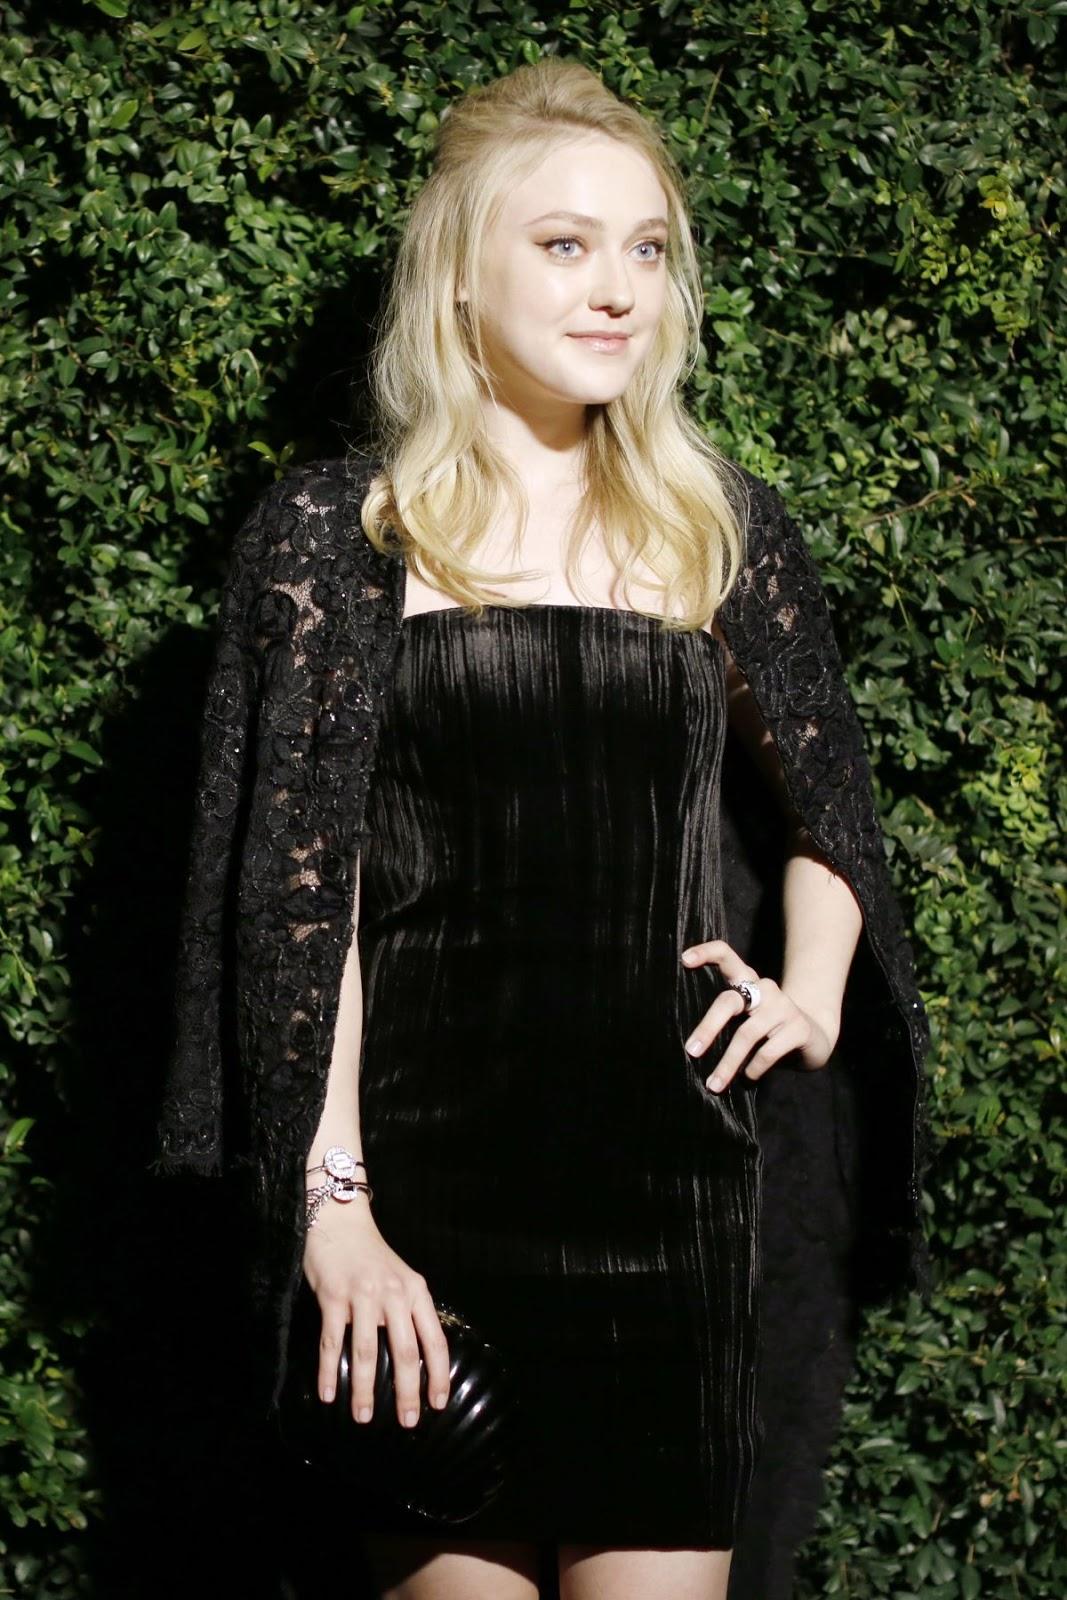 Brimstone actress Dakota Fanning at Chanel & Charles Finch Pre-Oscar Party 2016